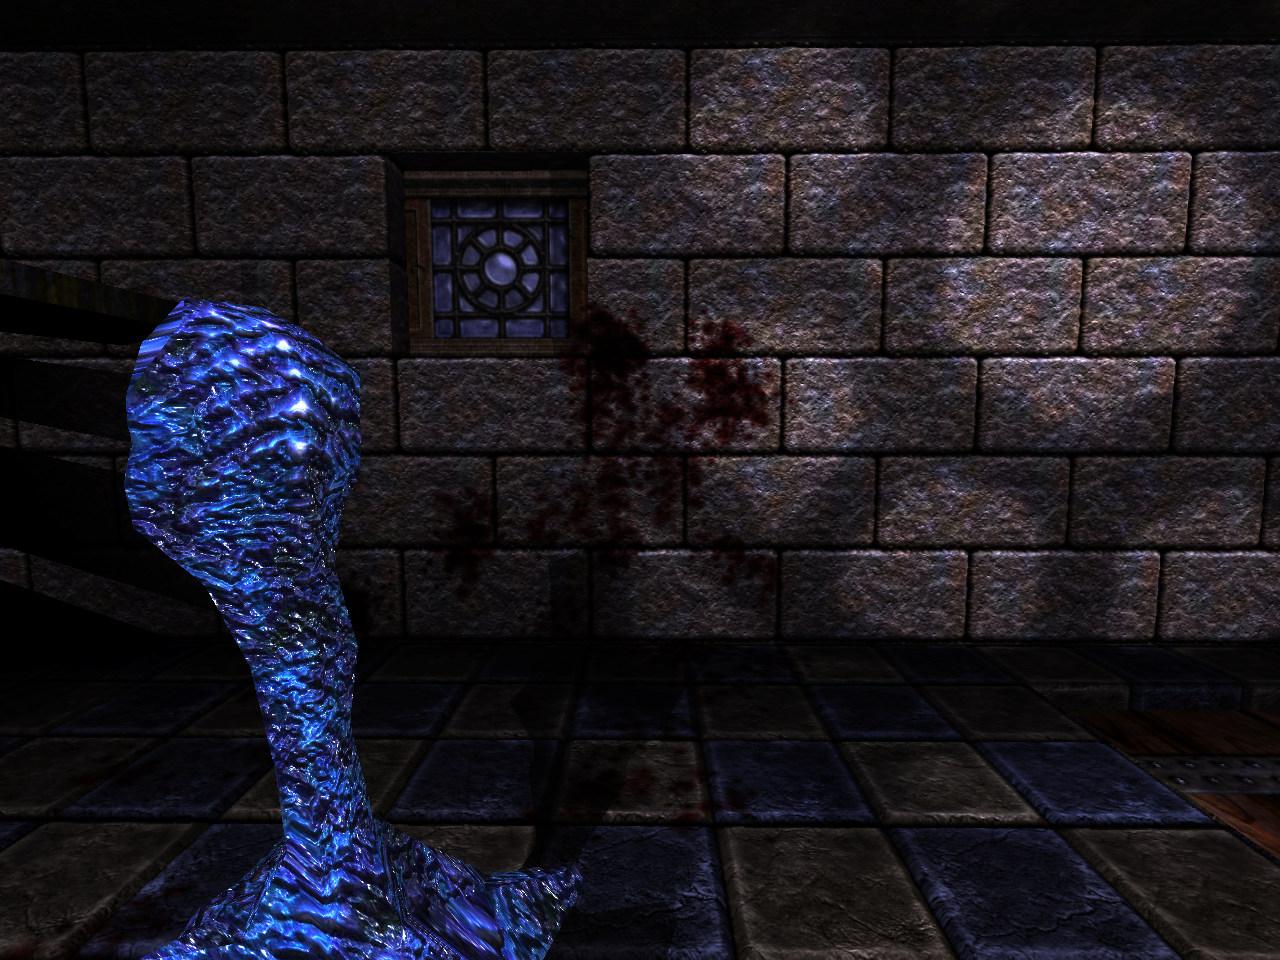 Quake Reforged - Bestiary - Quake - The Spawn Quake 1 Monsters